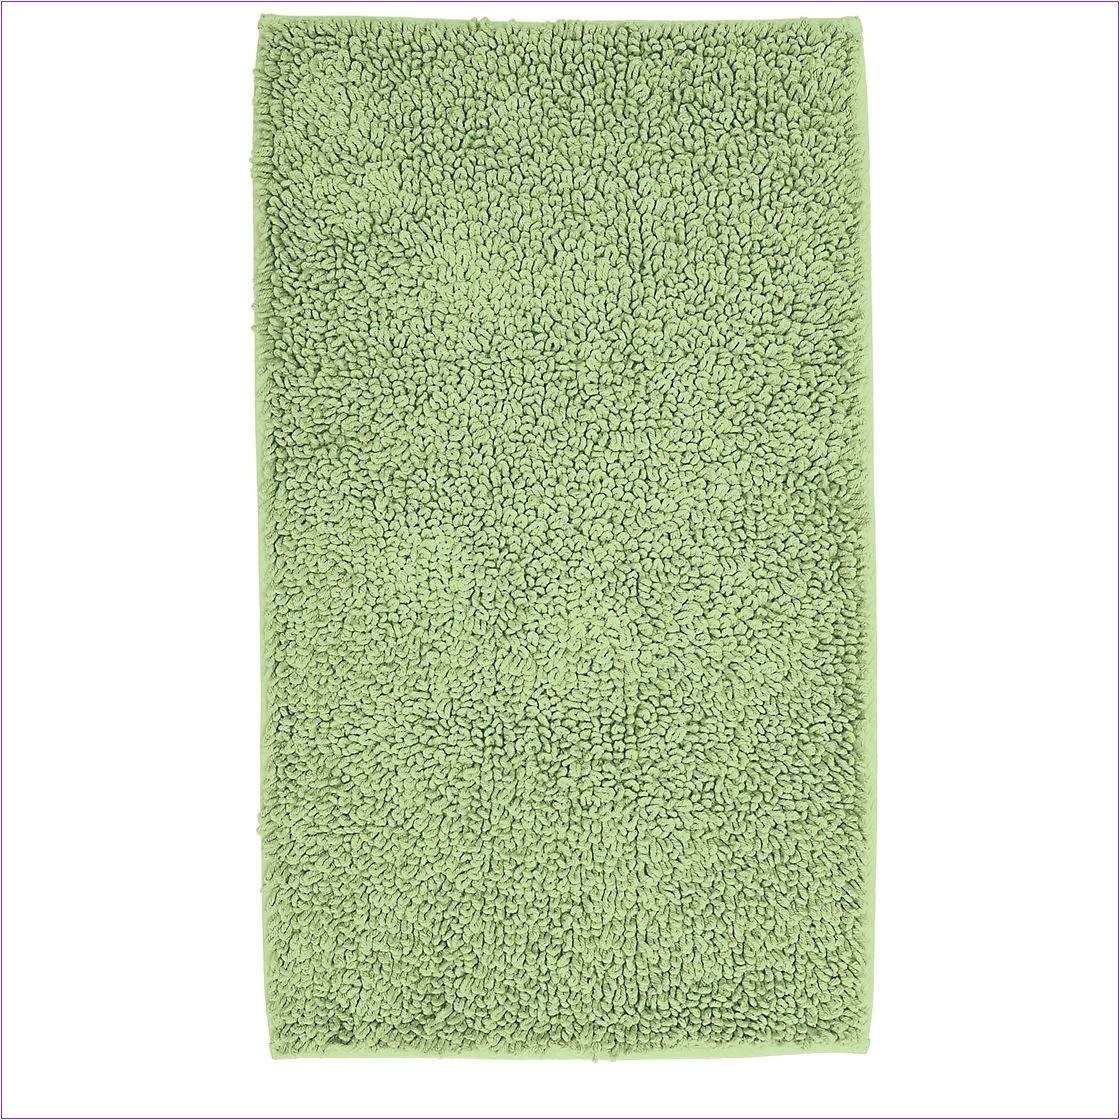 tahari home rugs luxury pany cottona a chunky bath rug the pany store of inspirational